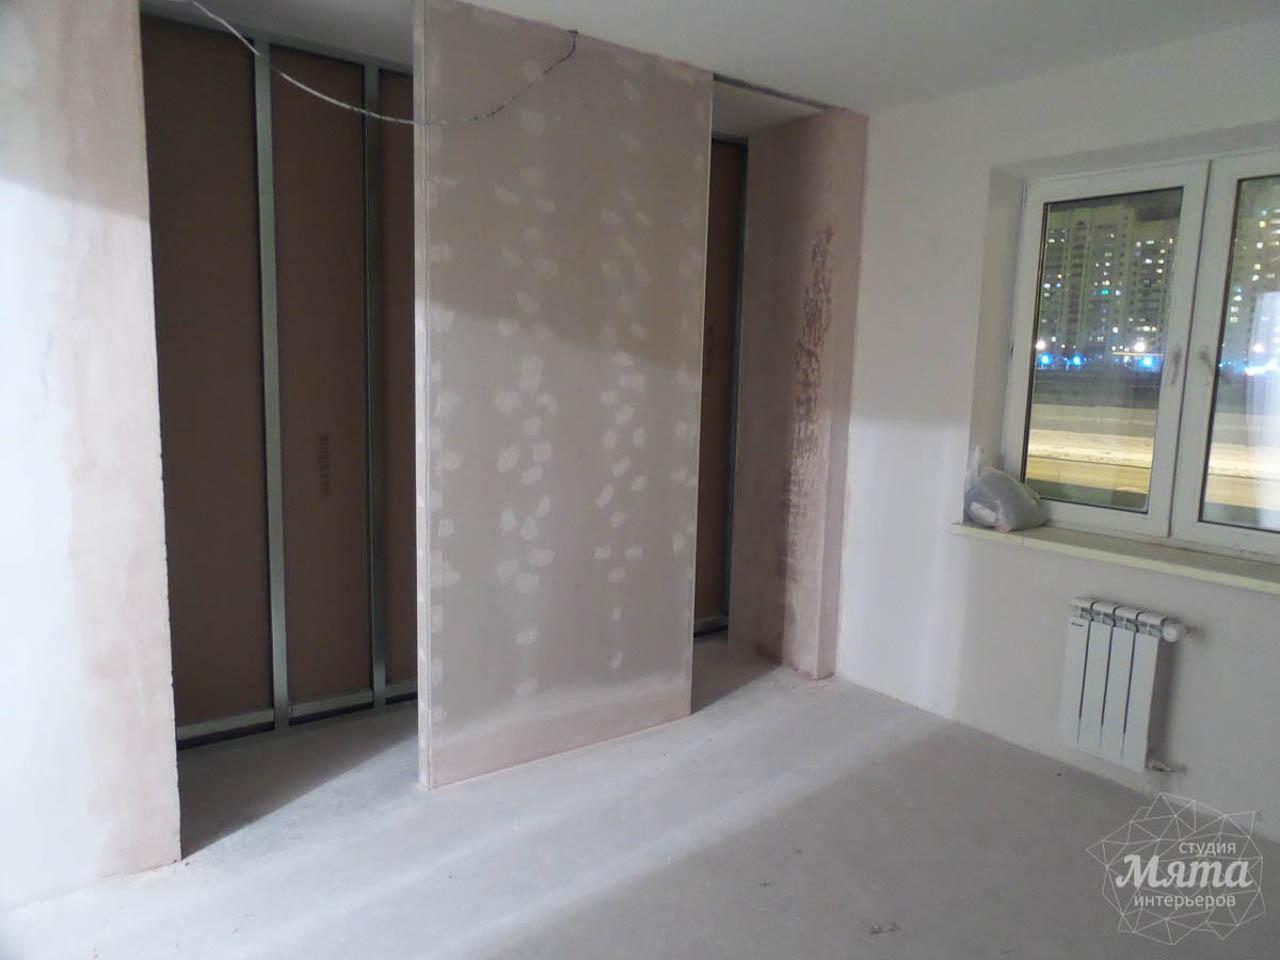 Дизайн интерьера и ремонт трехкомнатной квартиры по ул. Фучика 9 3